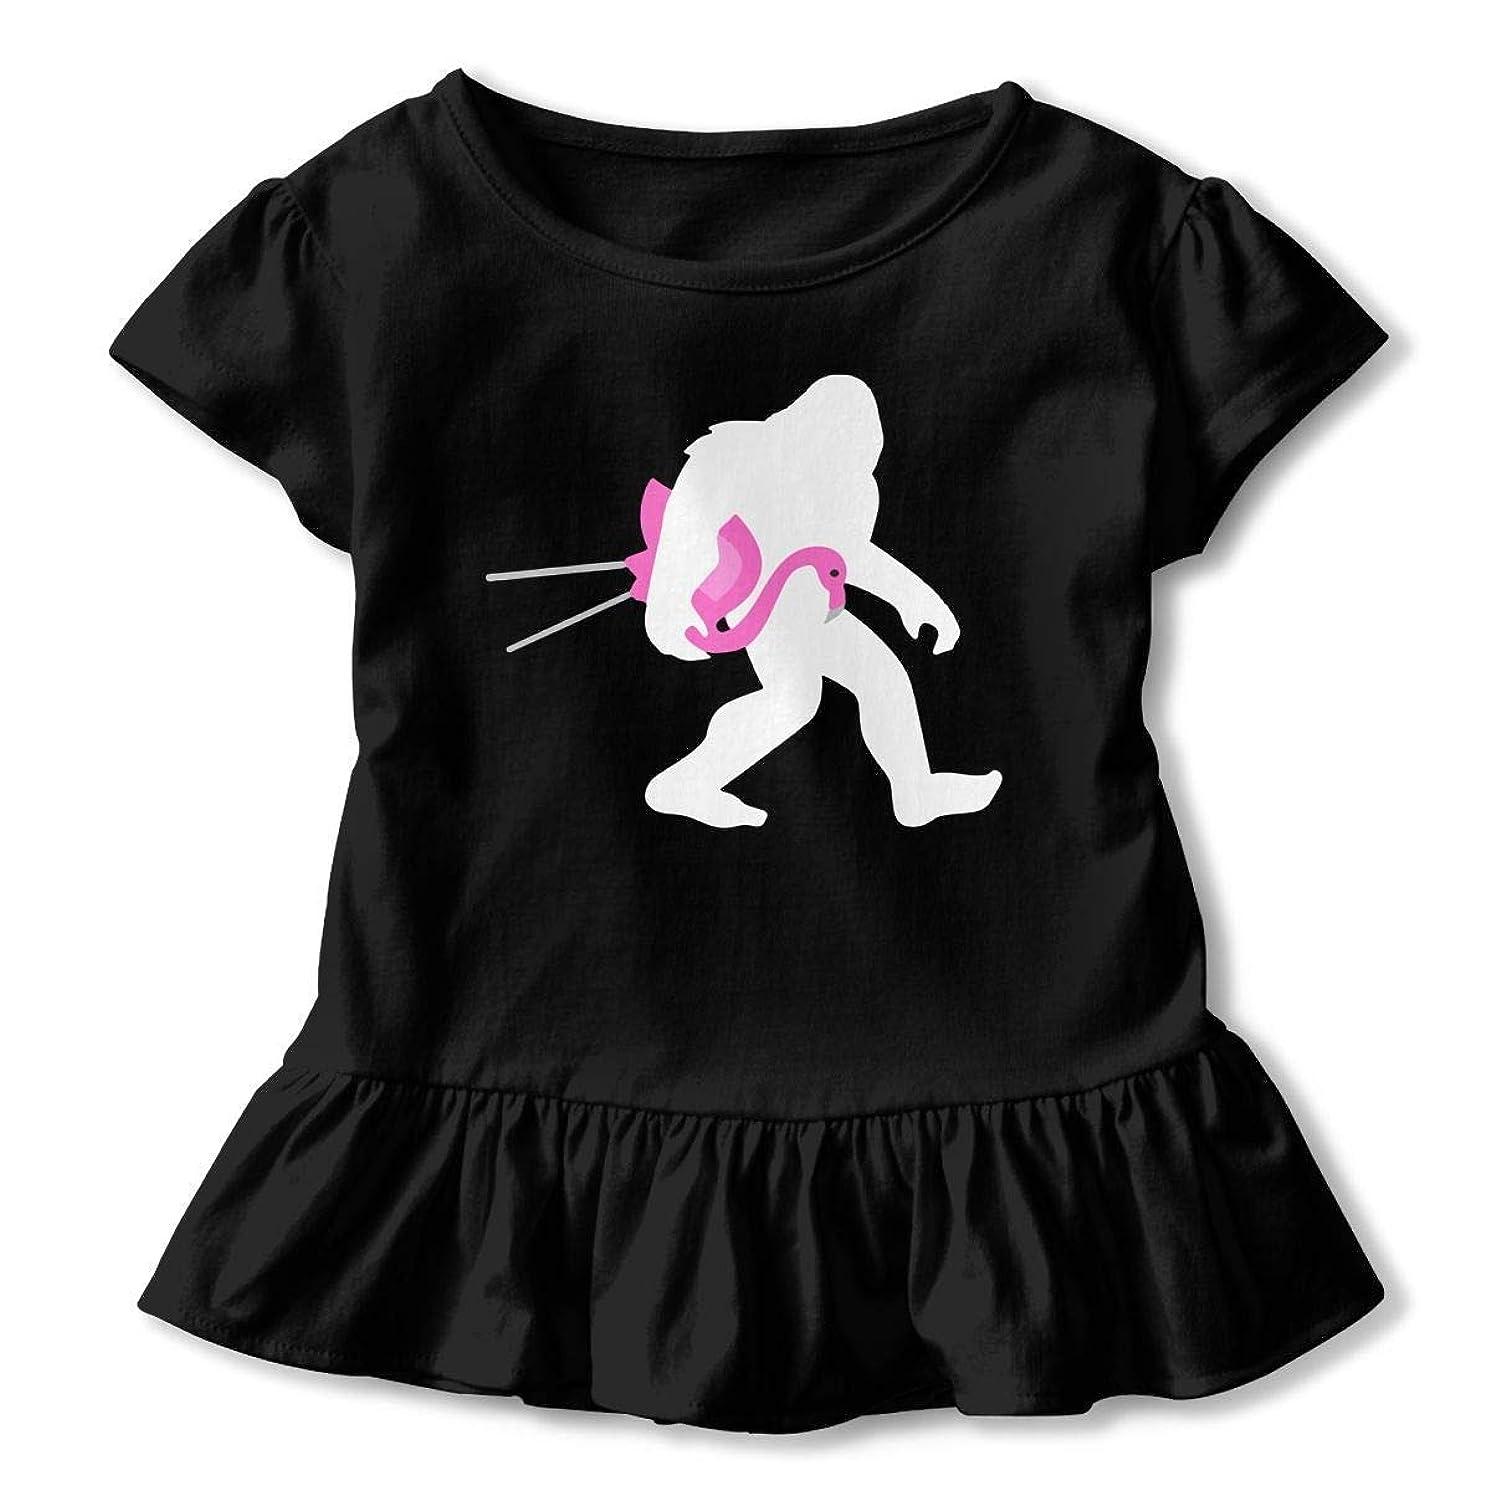 SDHEIJKY Bigfoot and Lawn Flamingo Toddler/Infant Girls Short Sleeve Shirts Ruffles Shirt T-Shirt for 2-6T